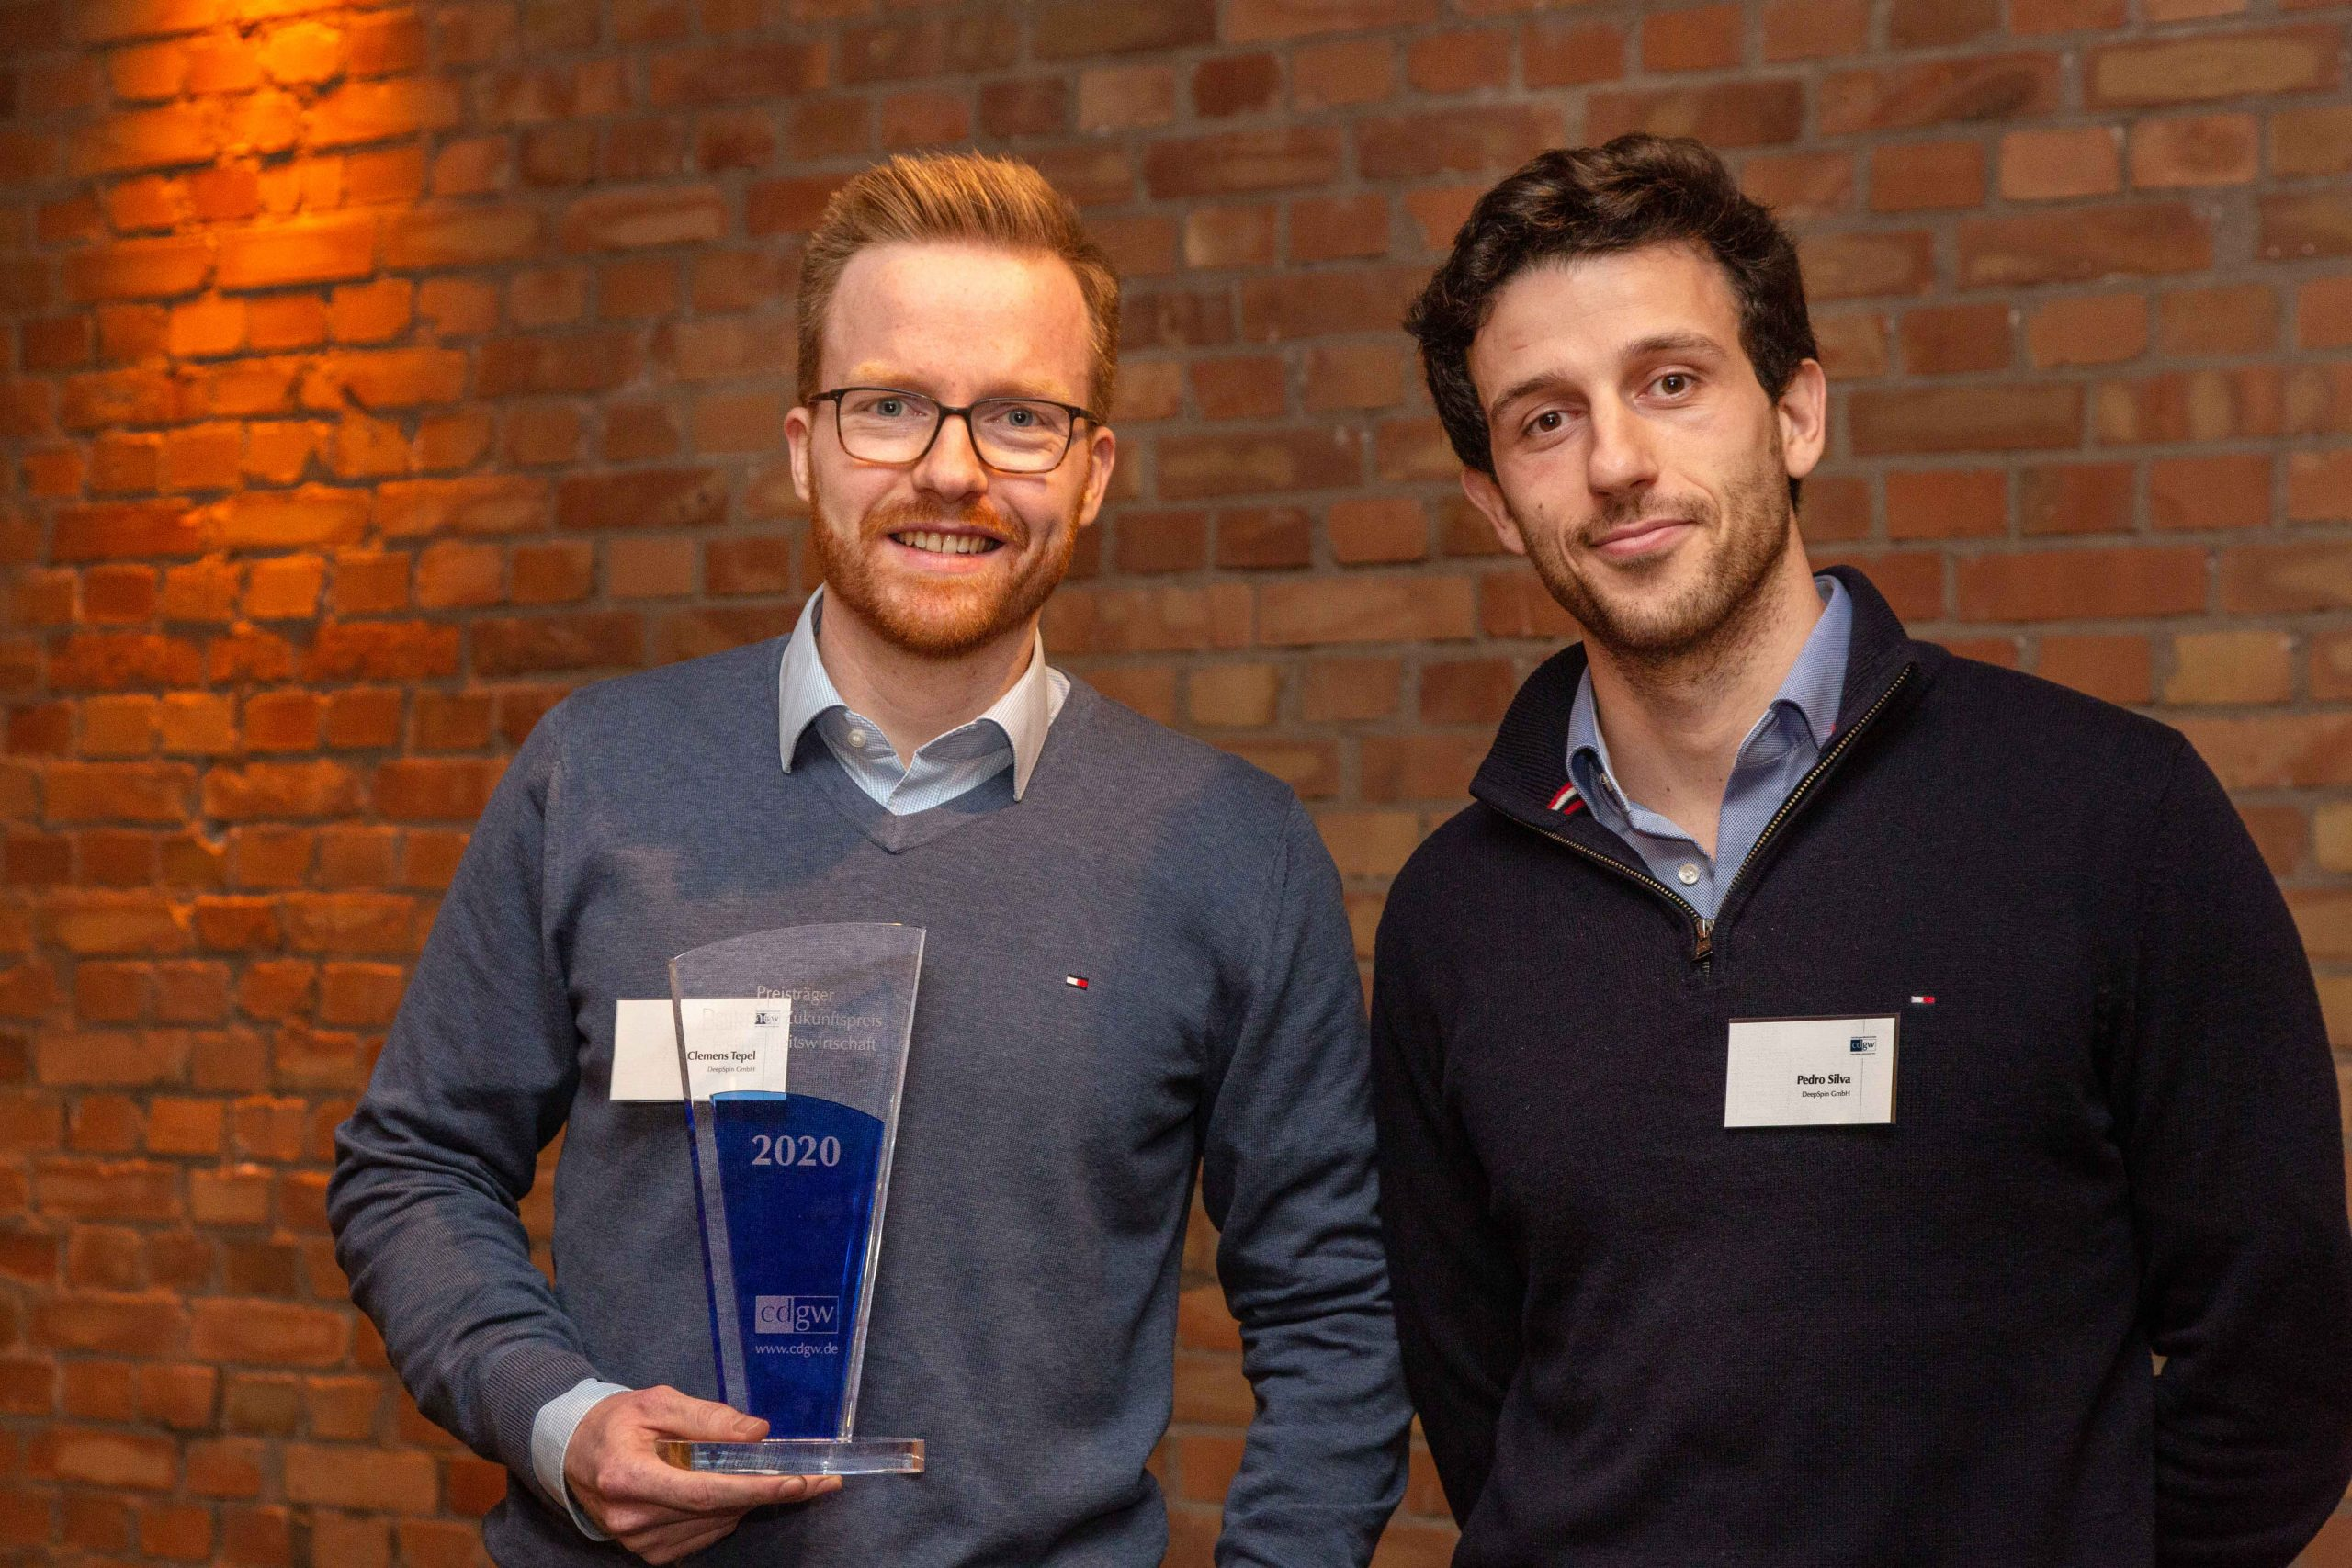 Cdgw-Zukunftspreis 2021 In Berlin